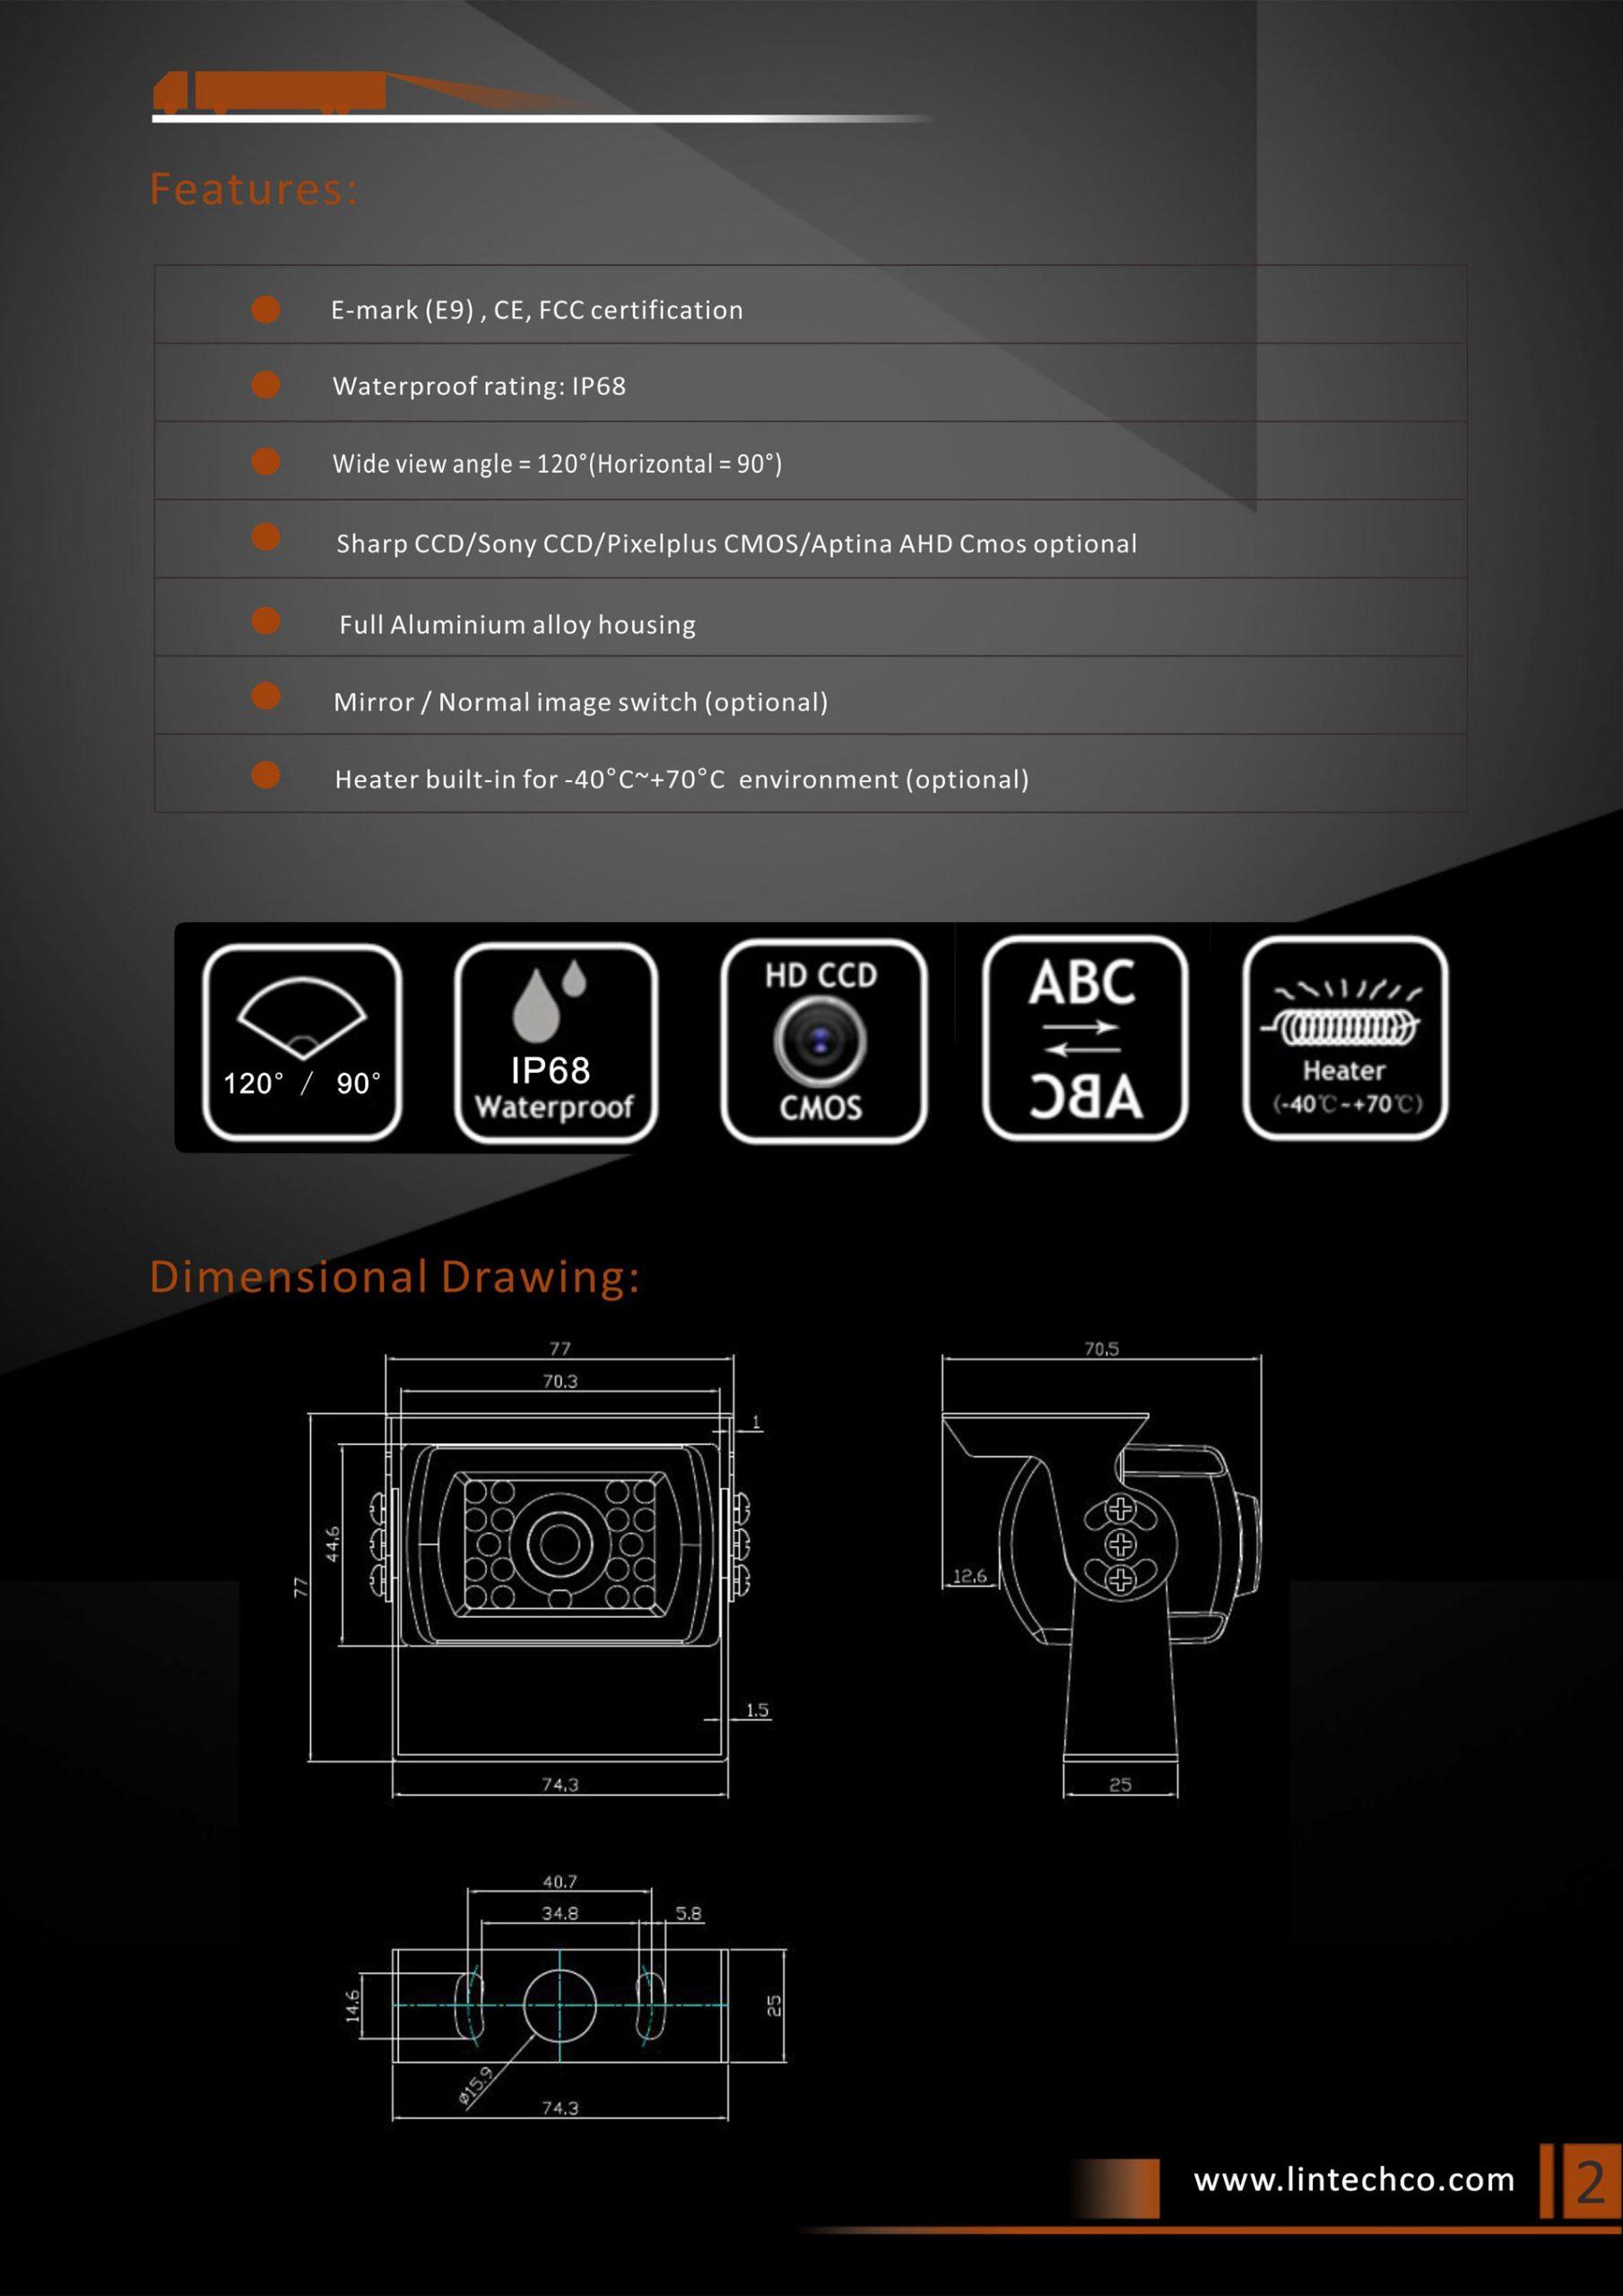 2.Classics Design Night Vision Waterproof Backup Camera